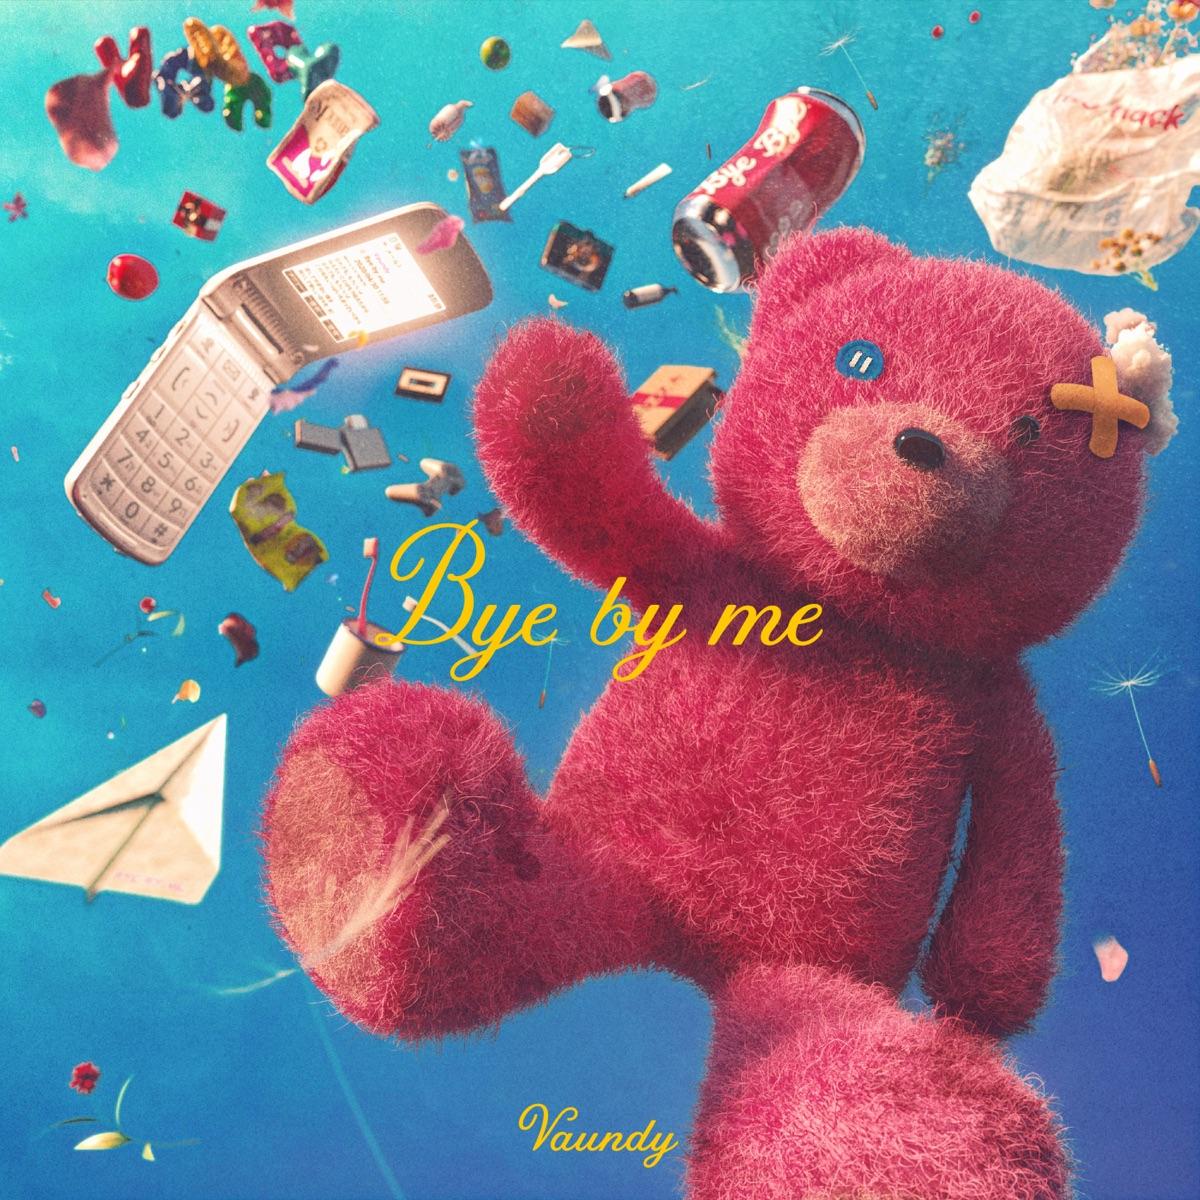 『Vaundy - Bye by me』収録の『Bye by me』ジャケット